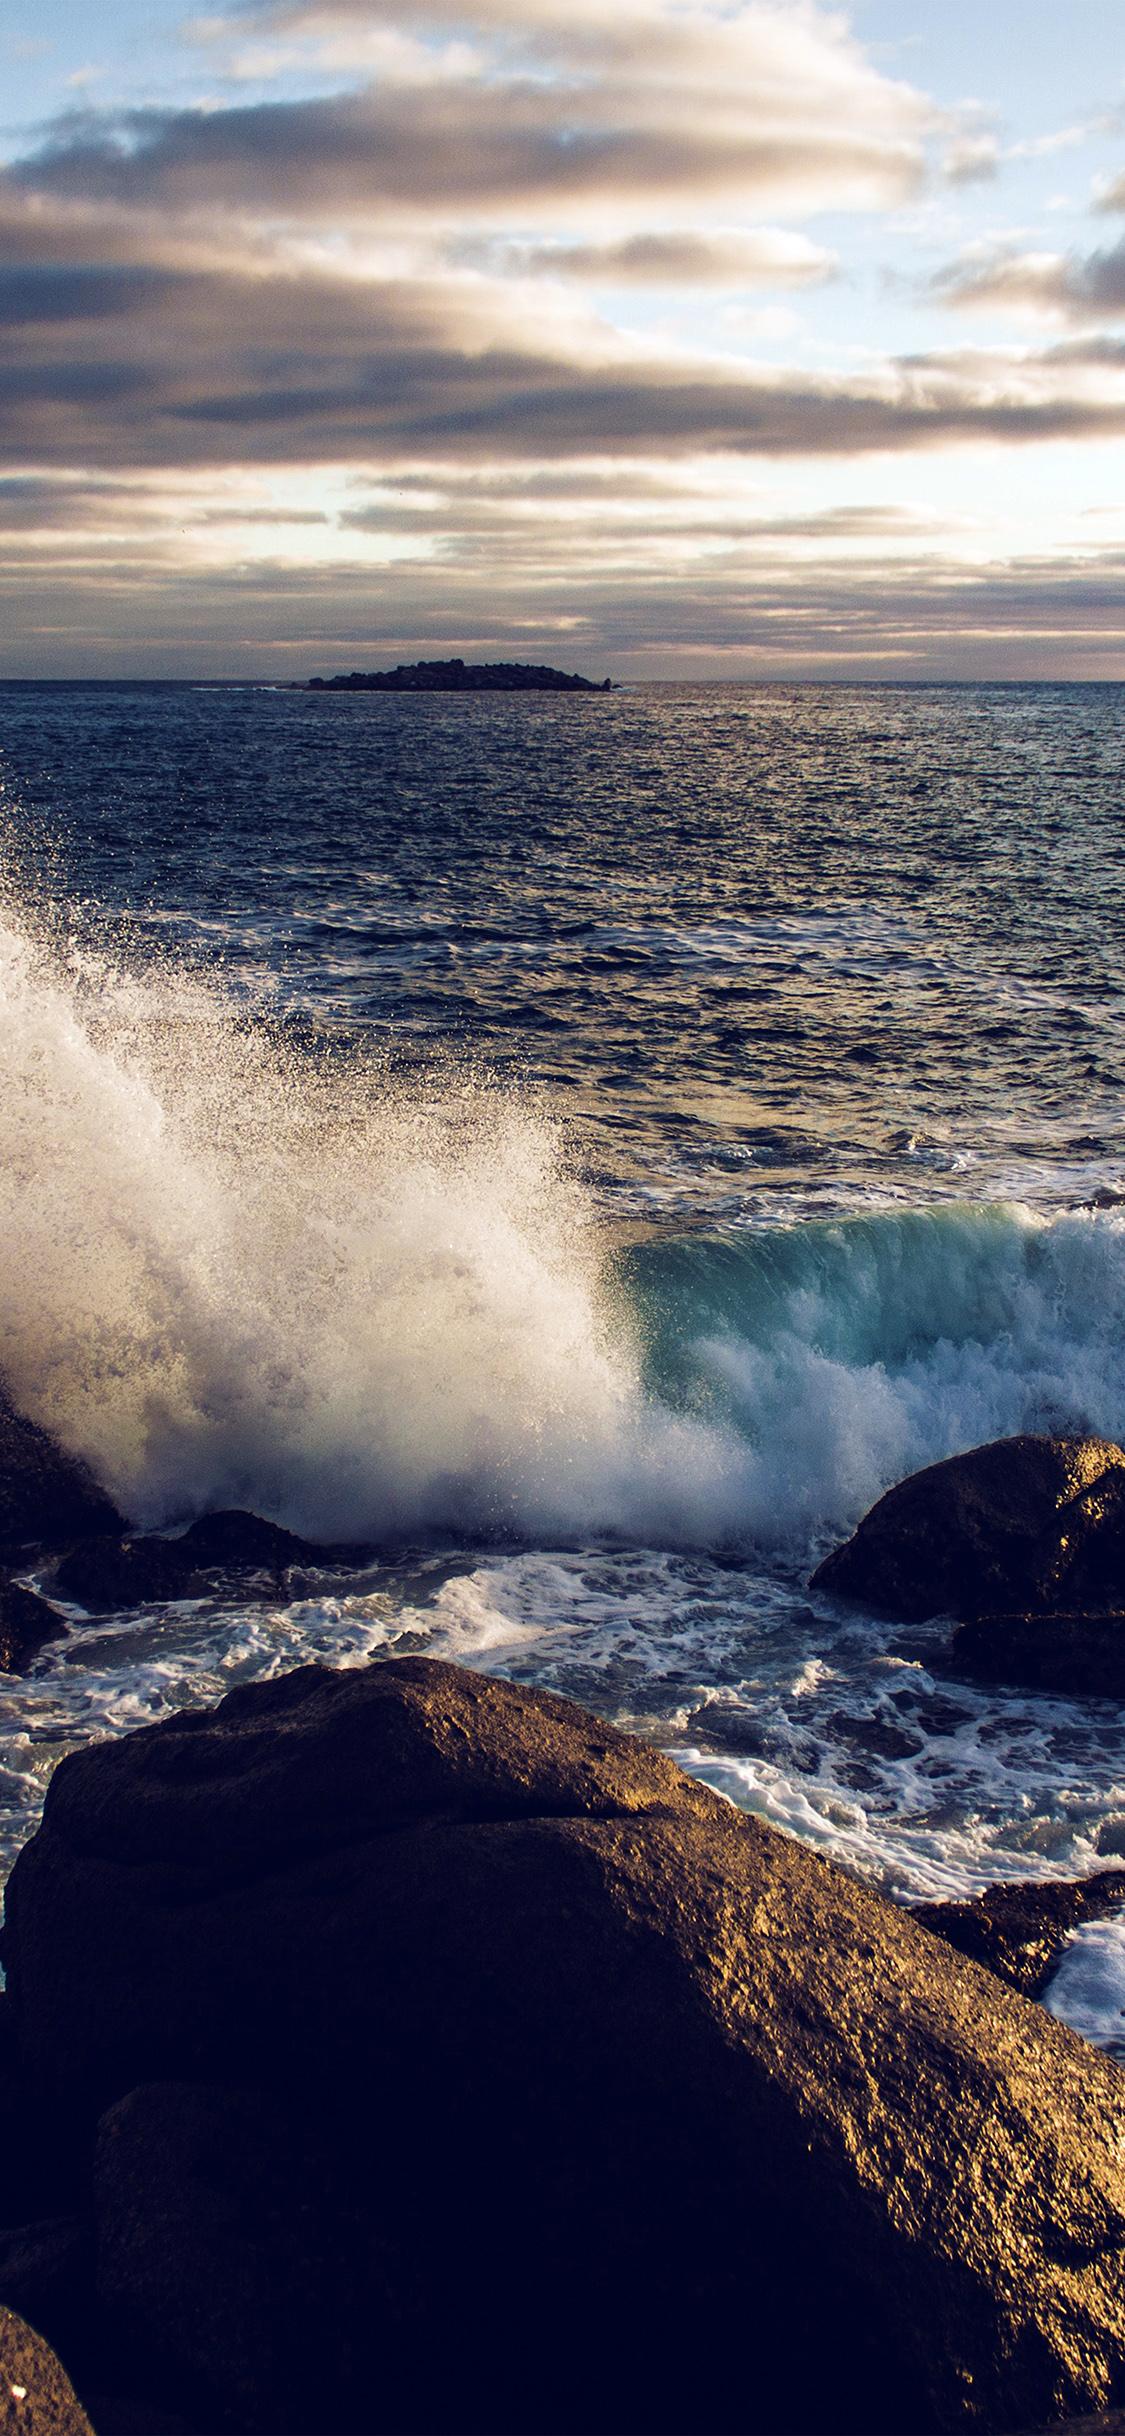 iPhonexpapers.com-Apple-iPhone-wallpaper-nj99-rock-wave-nature-sea-cold-blue